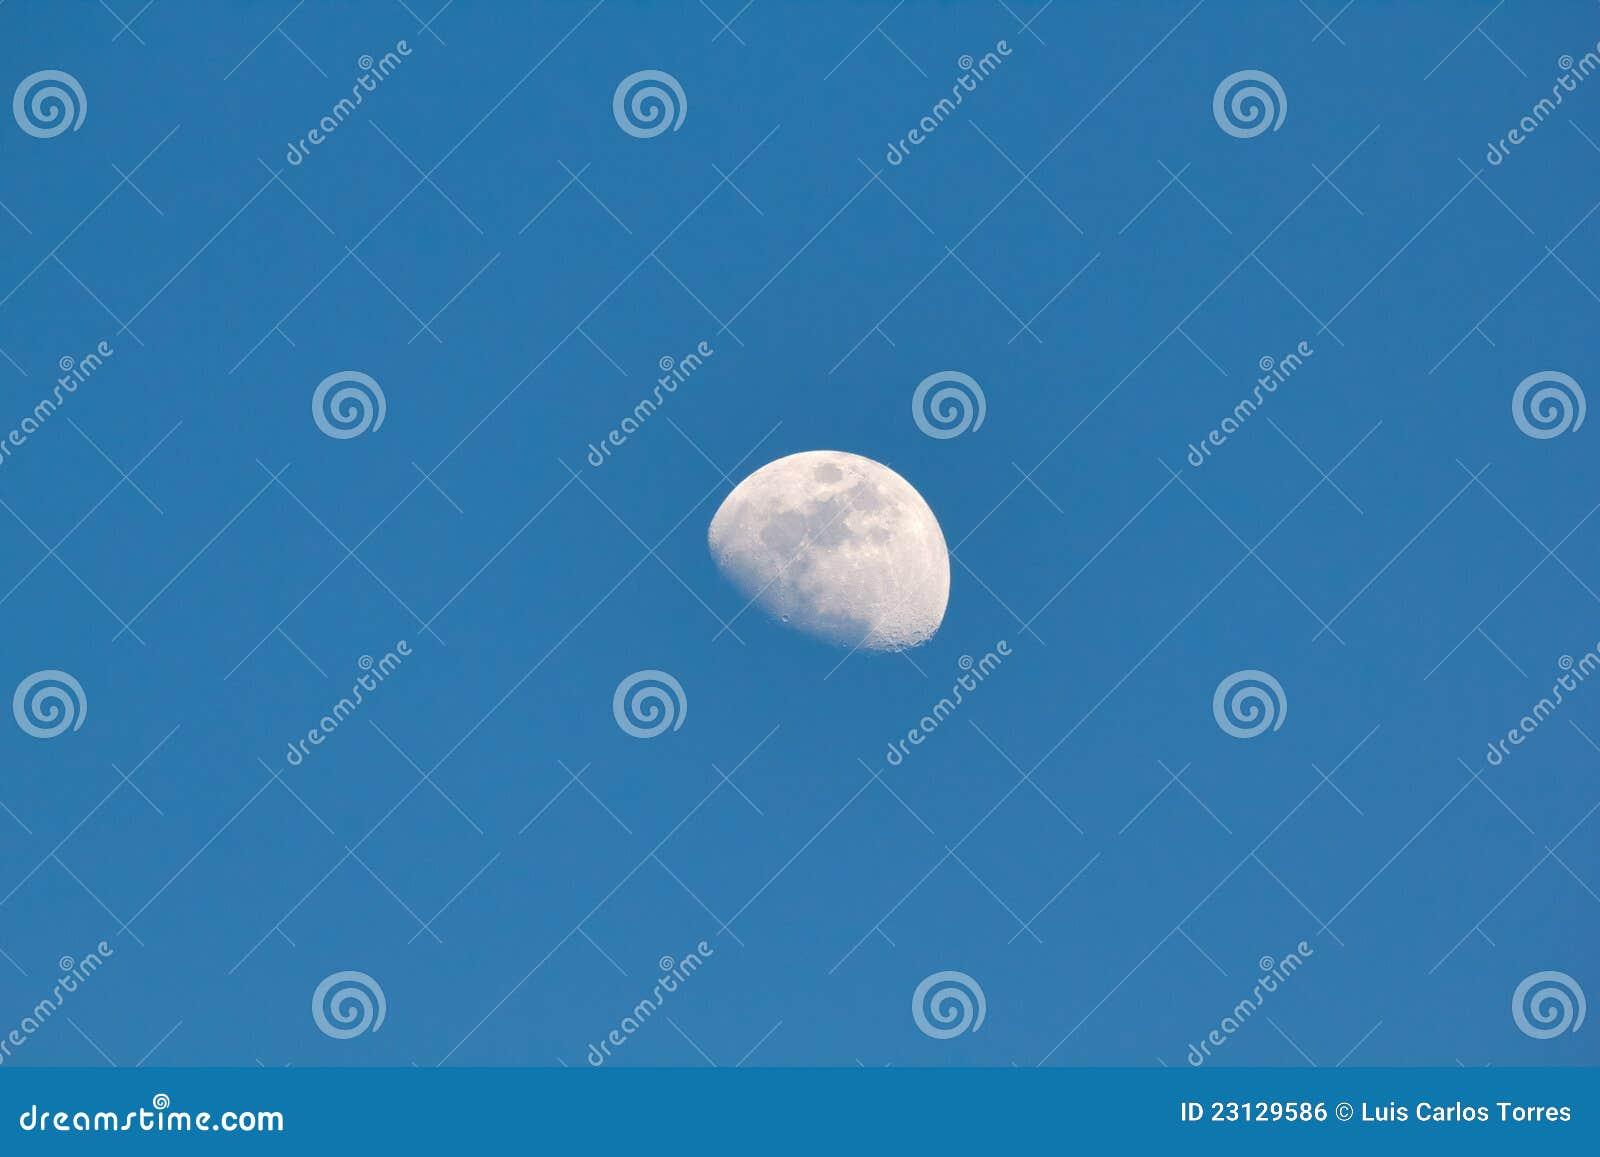 Moon still in the clear sky